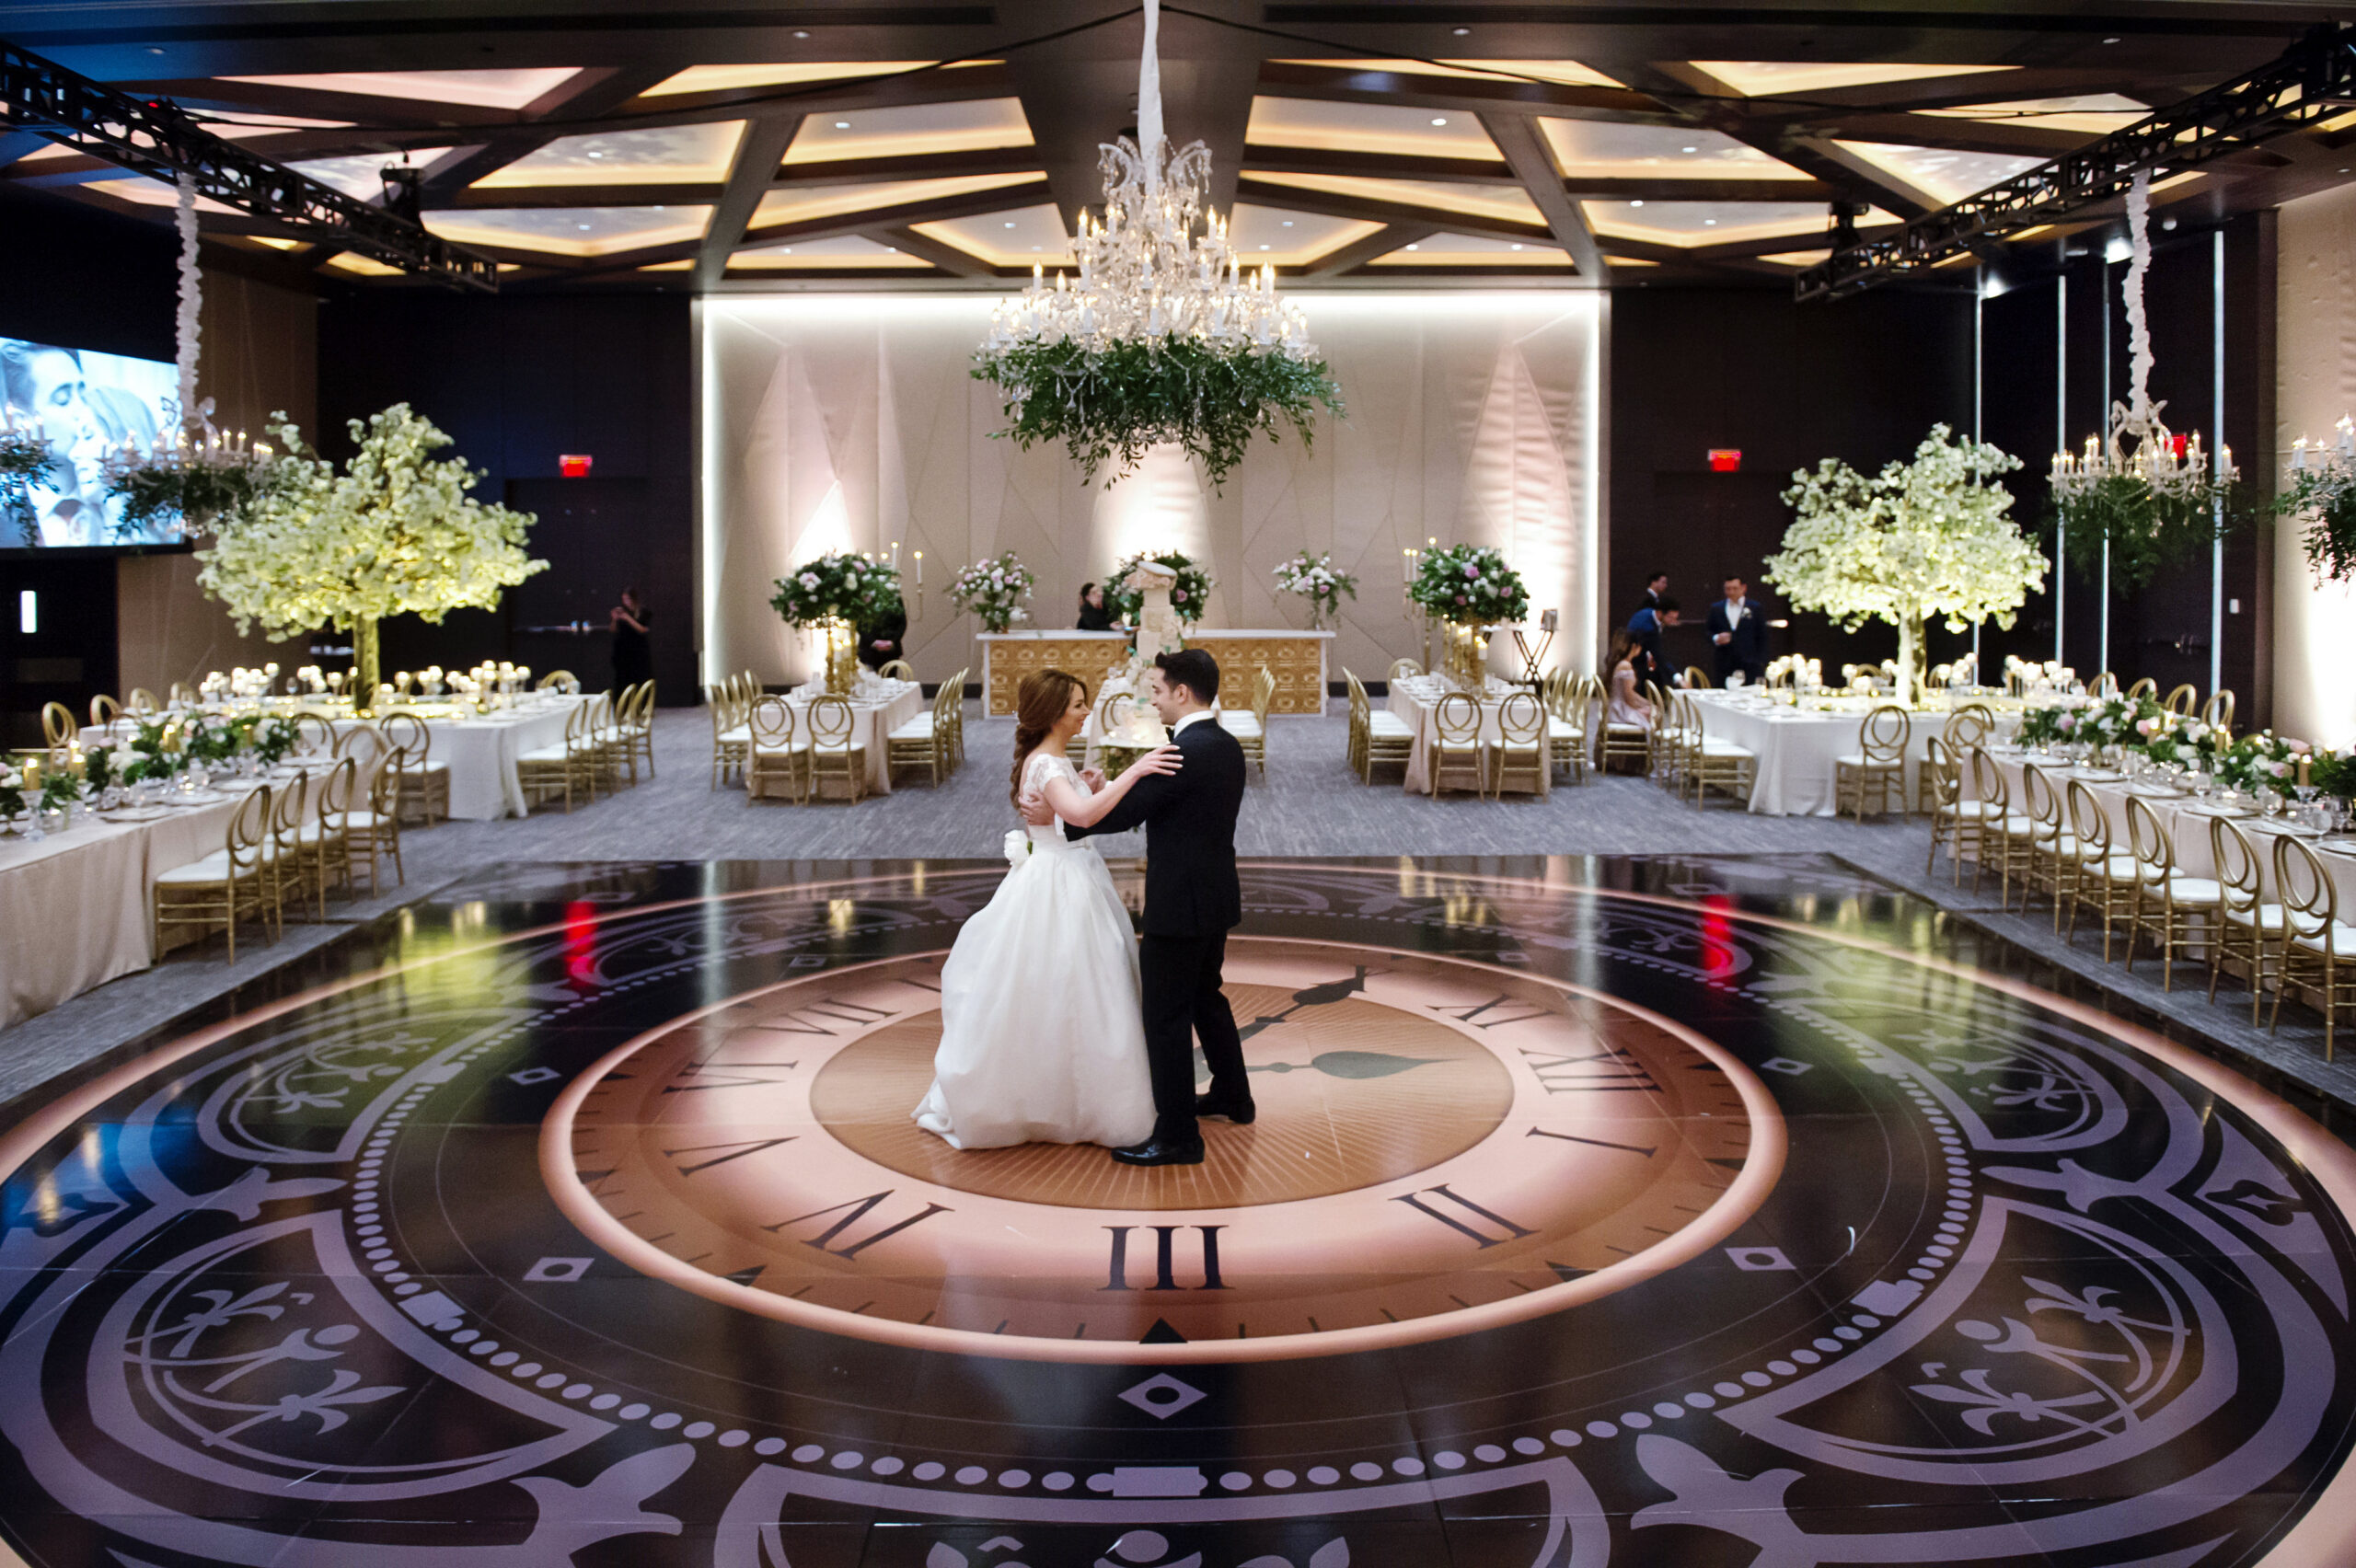 https://secureservercdn.net/45.40.145.151/kgq.ab5.myftpupload.com/wp-content/uploads/2020/04/Sanam-Soroush-s-Wedding-wedluxe-submission-0102-scaled.jpg?time=1627956768